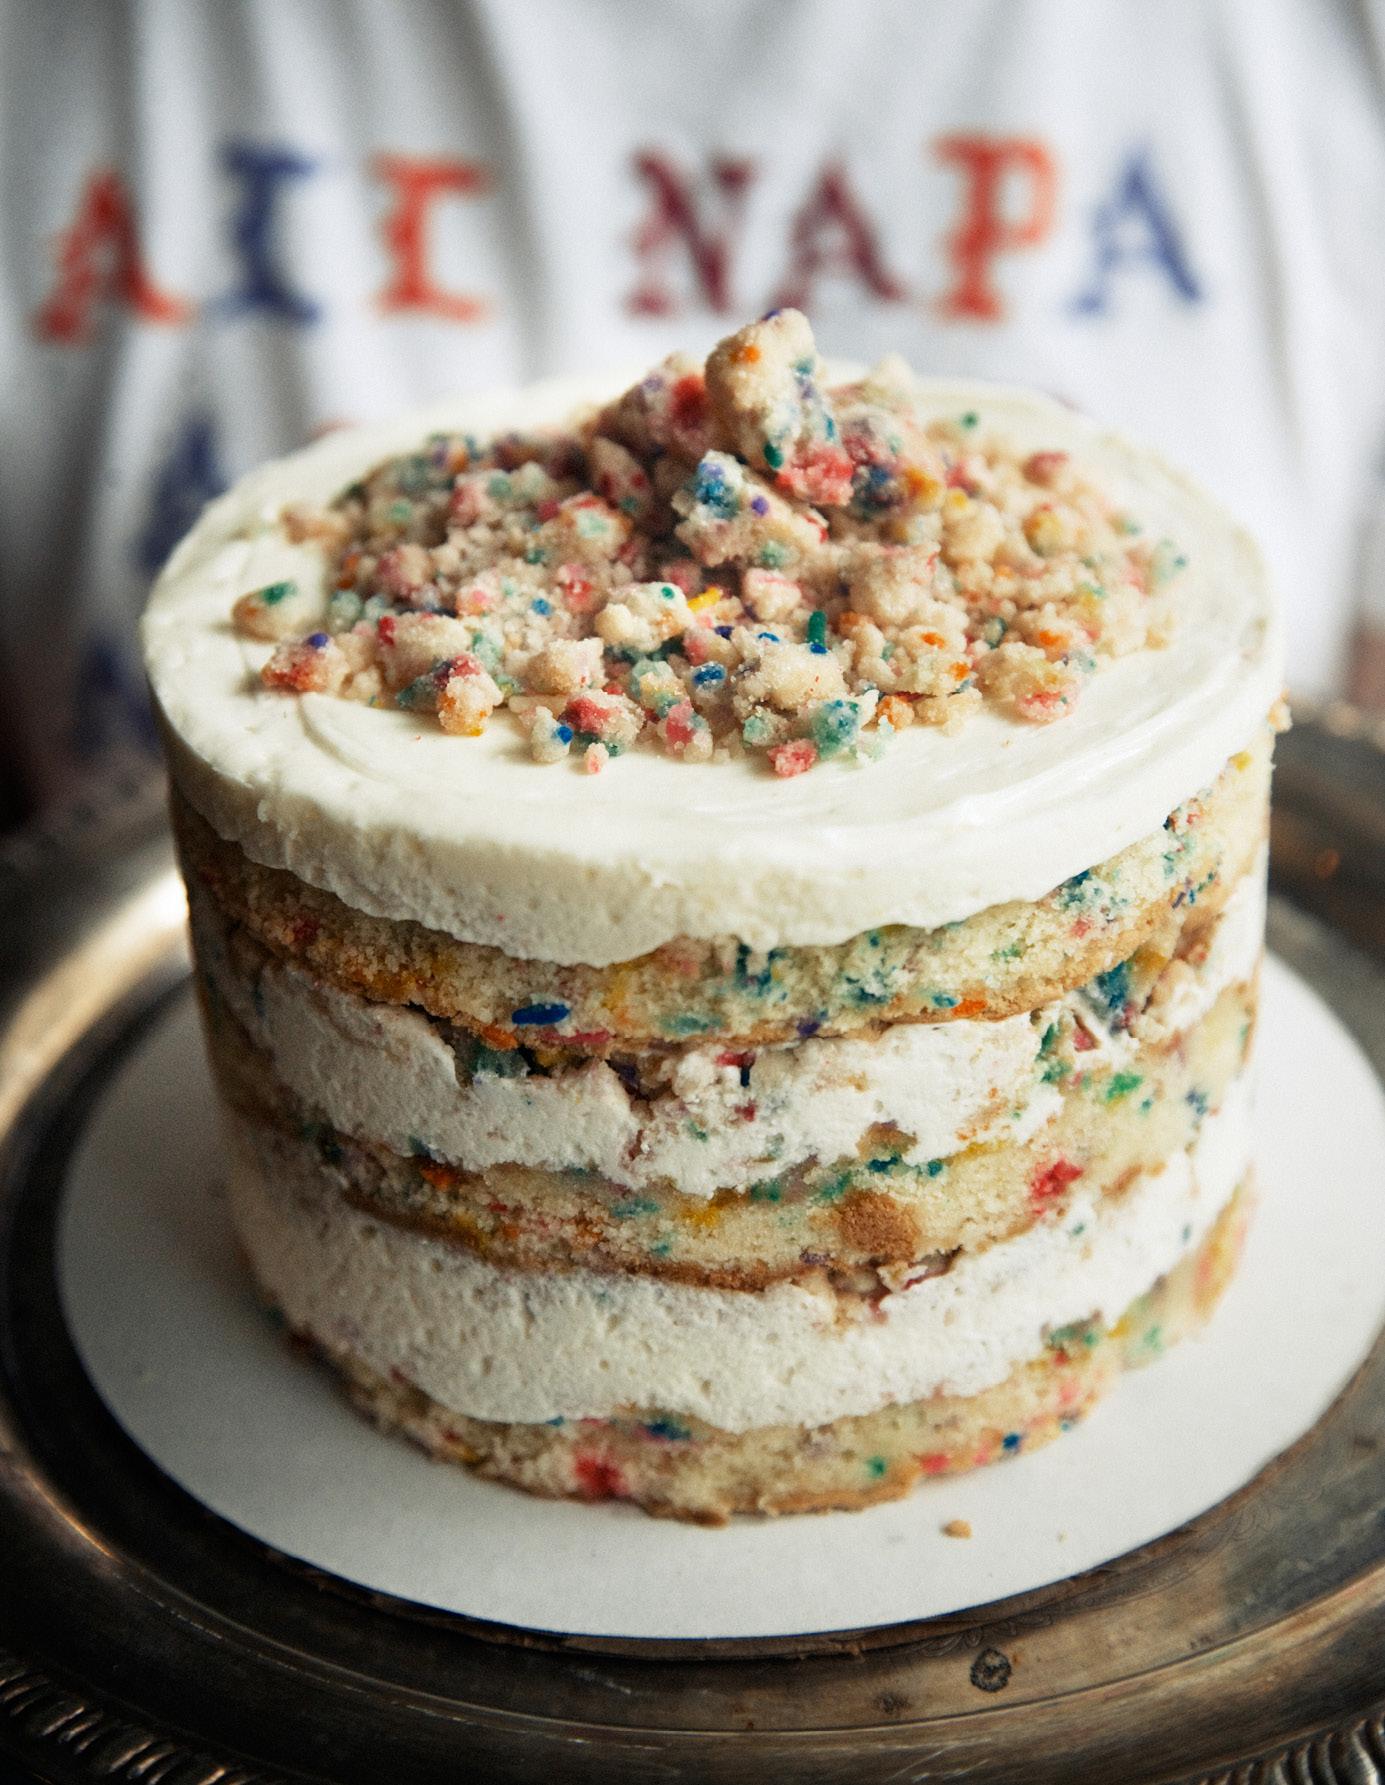 Best Birthday Cakes Nyc My blog